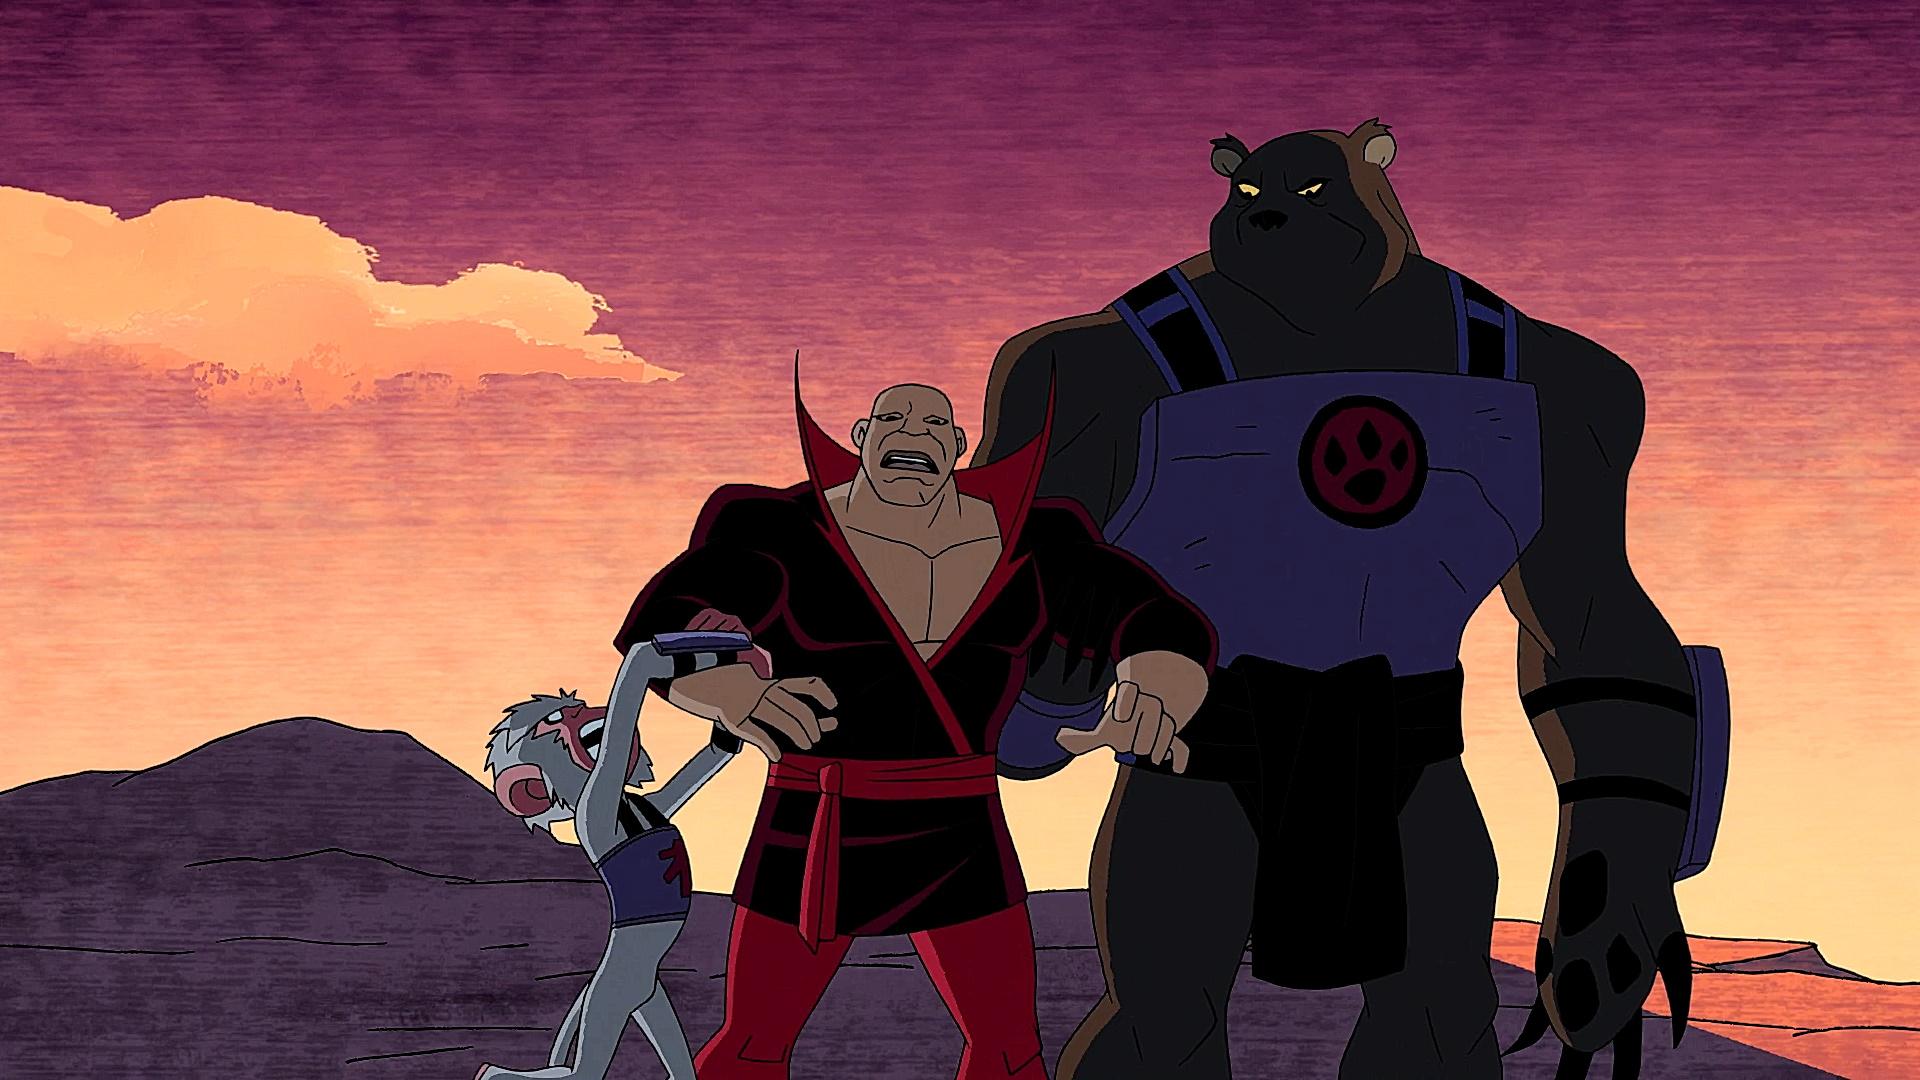 File:Chu-hui The Guardians.jpg